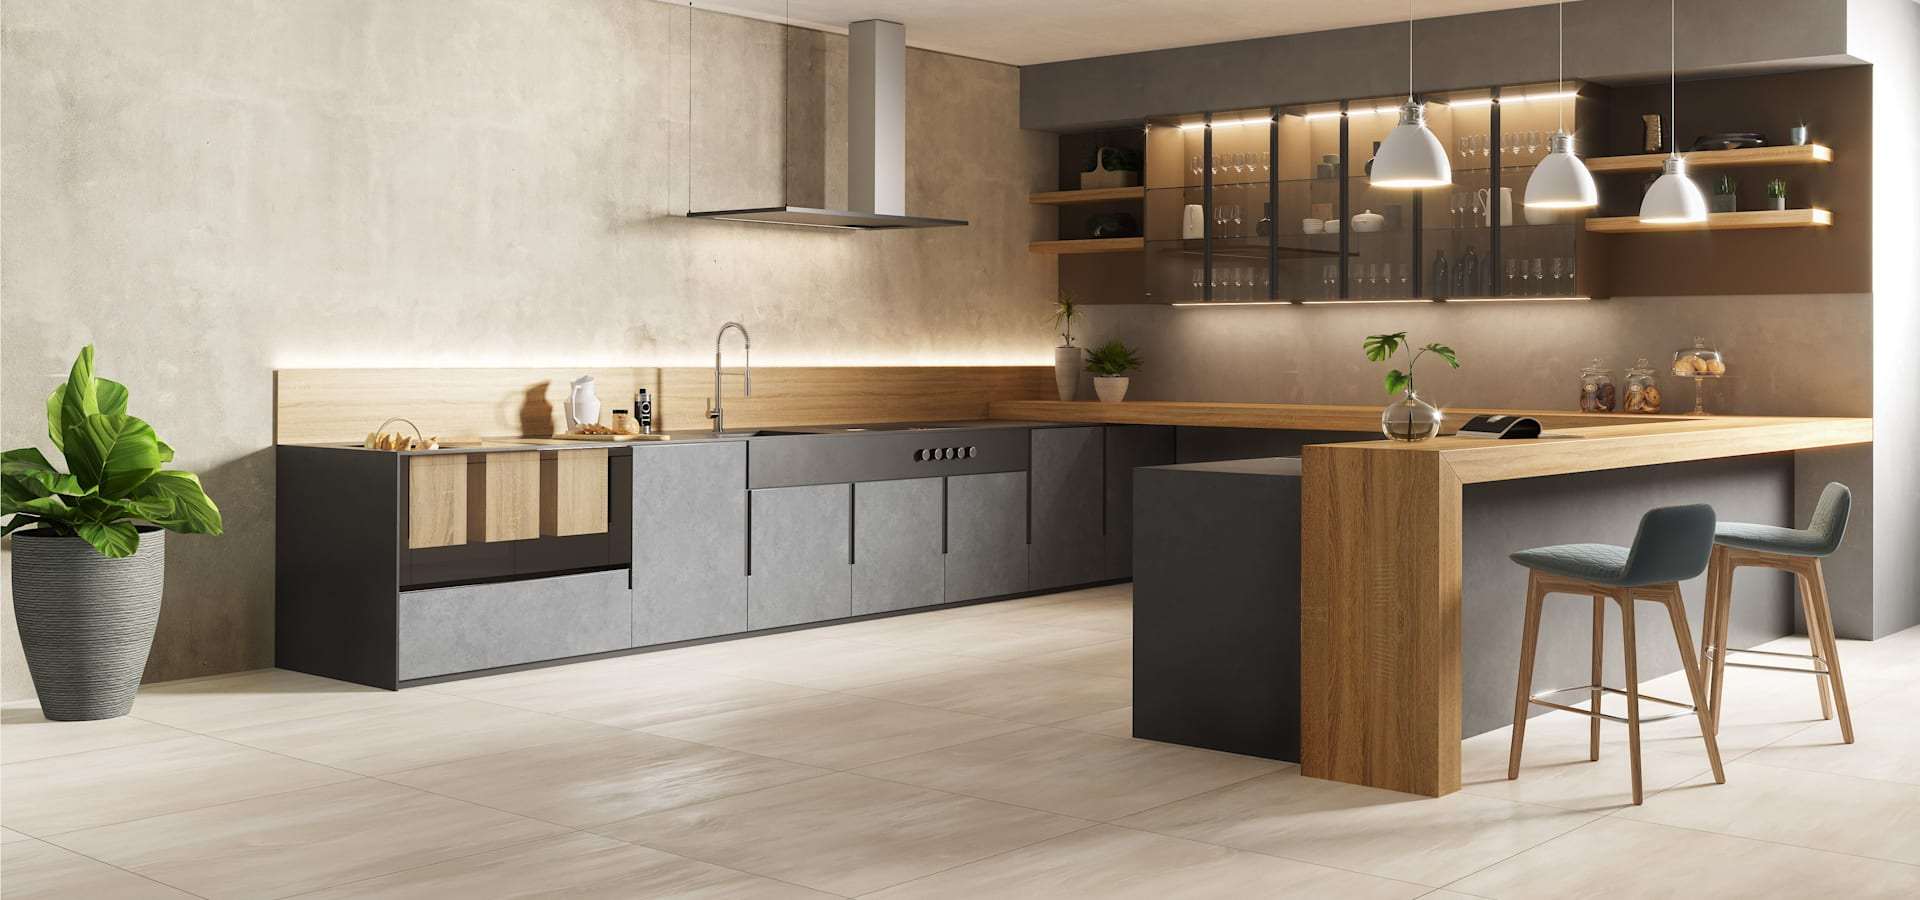 Gonçalrochas – Cozinhas – Love Kitchen